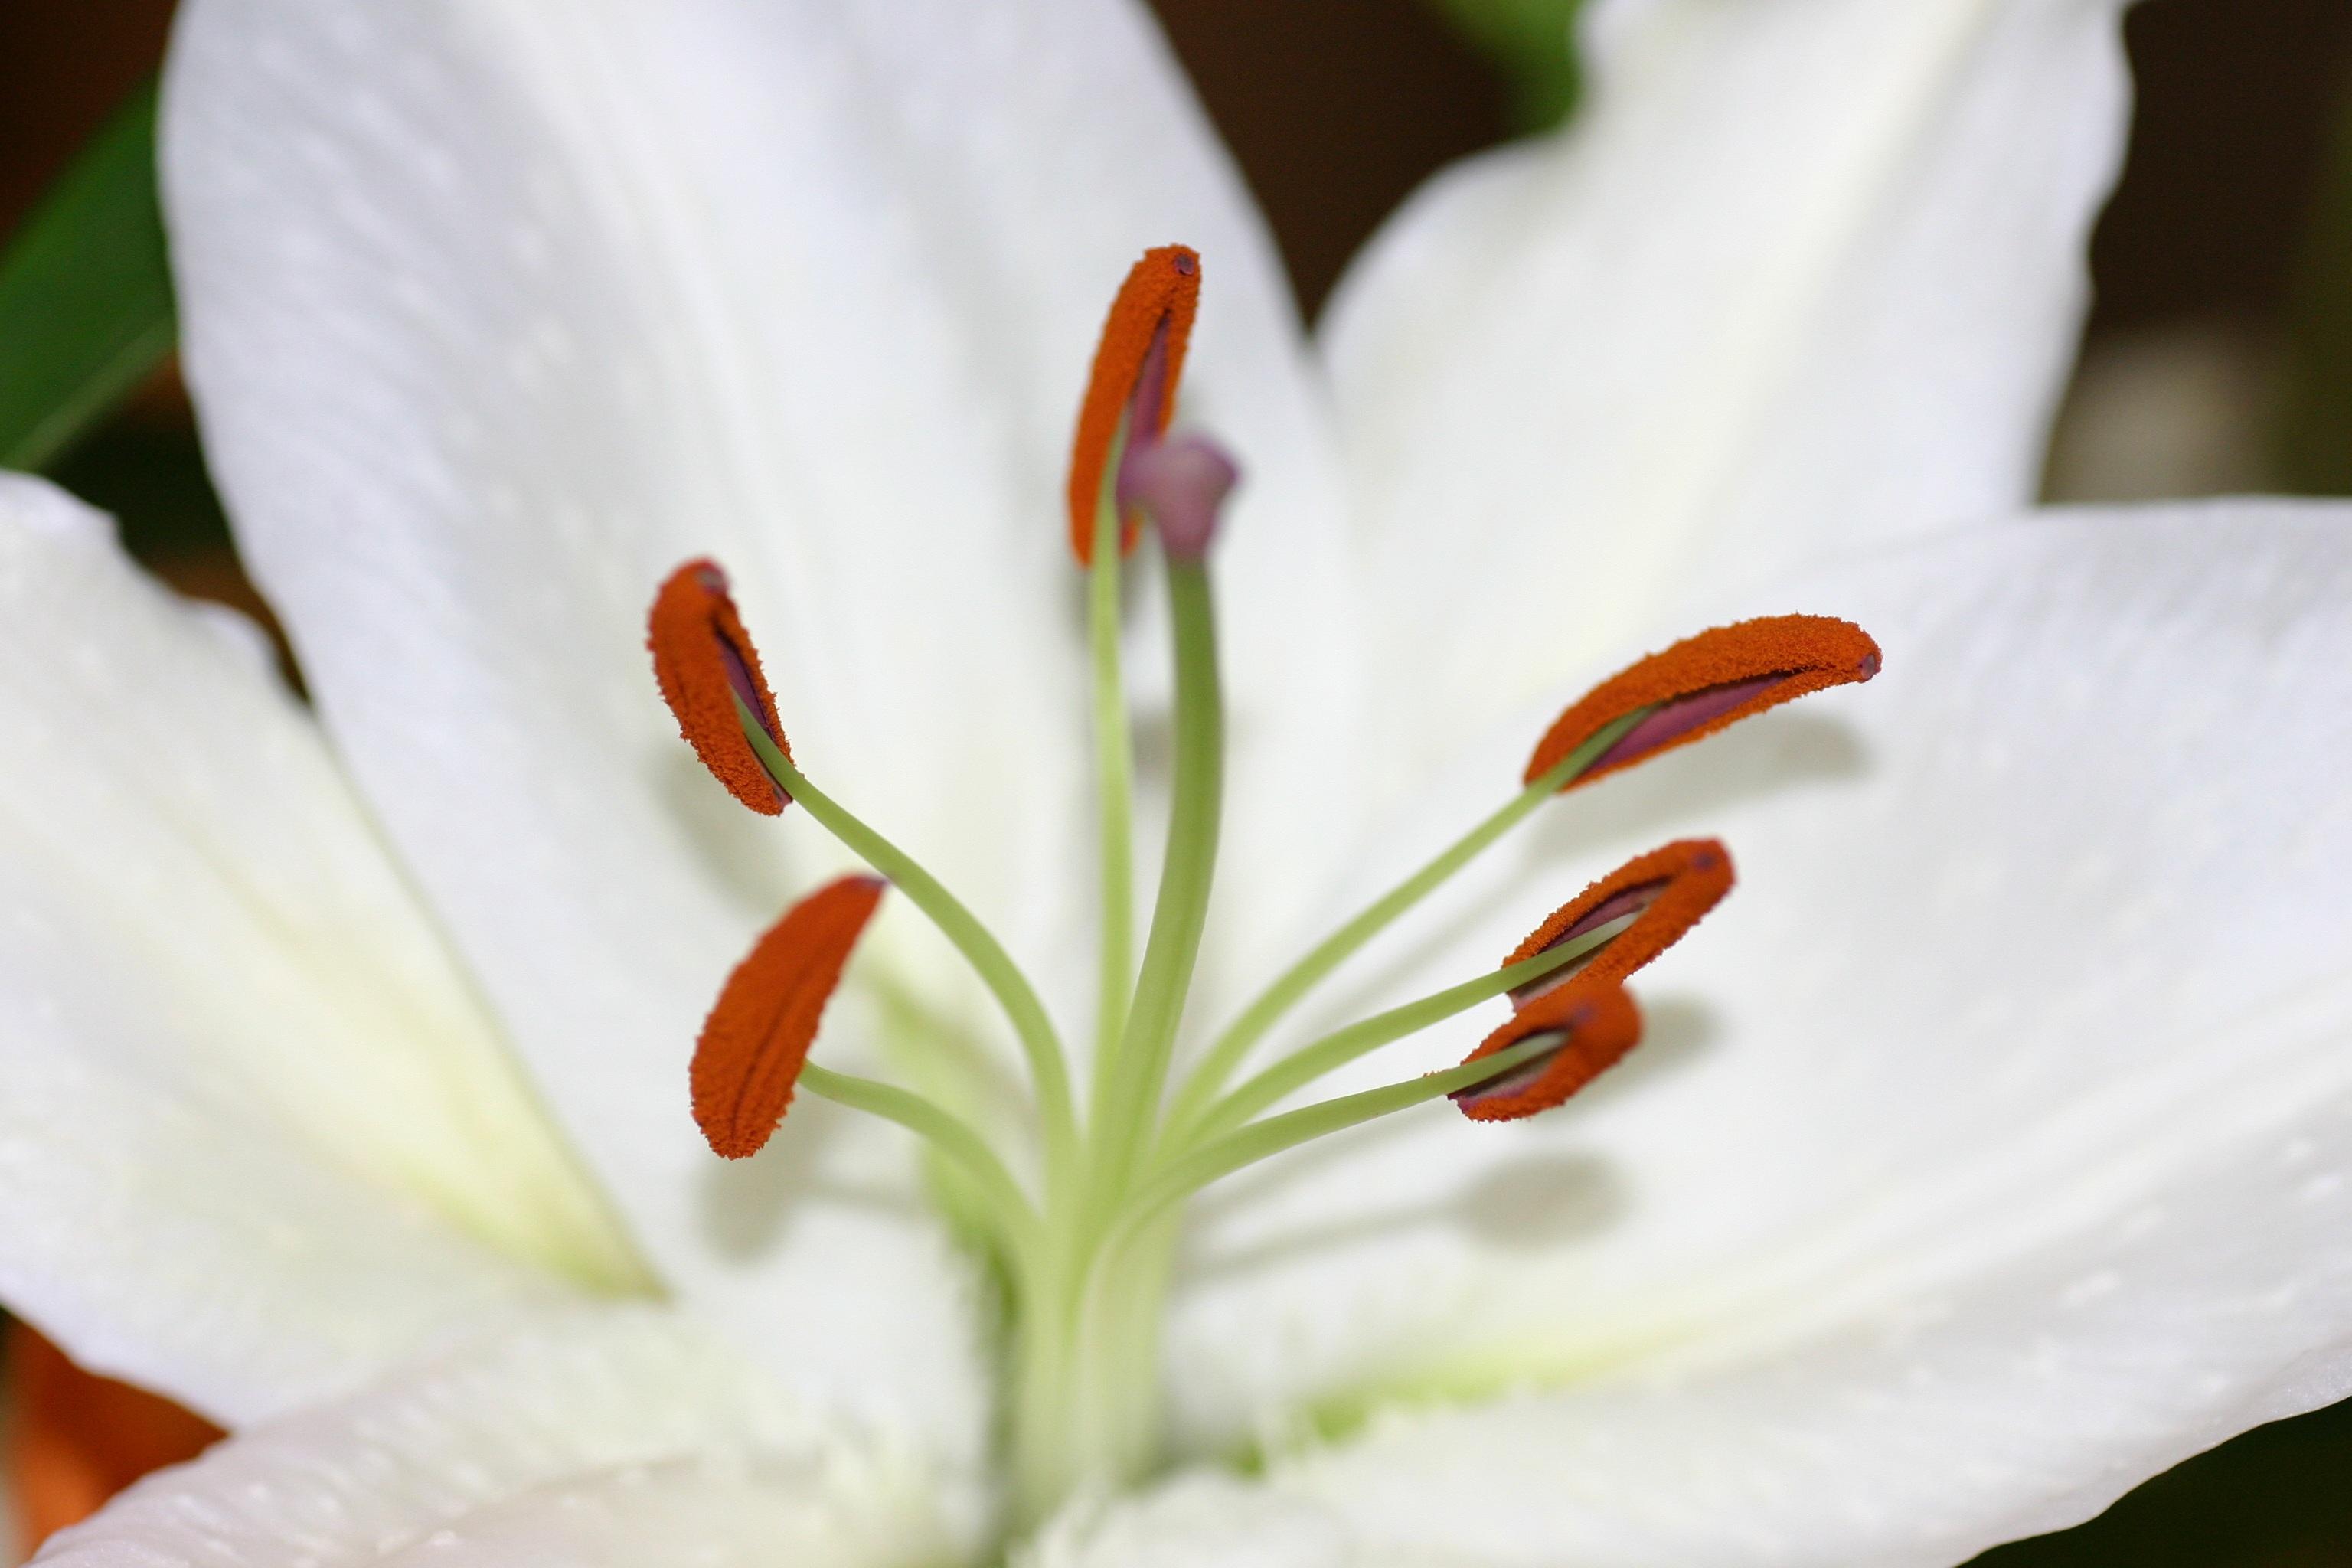 Free Images Nature Blossom Leaf Flower Petal Floral Bouquet